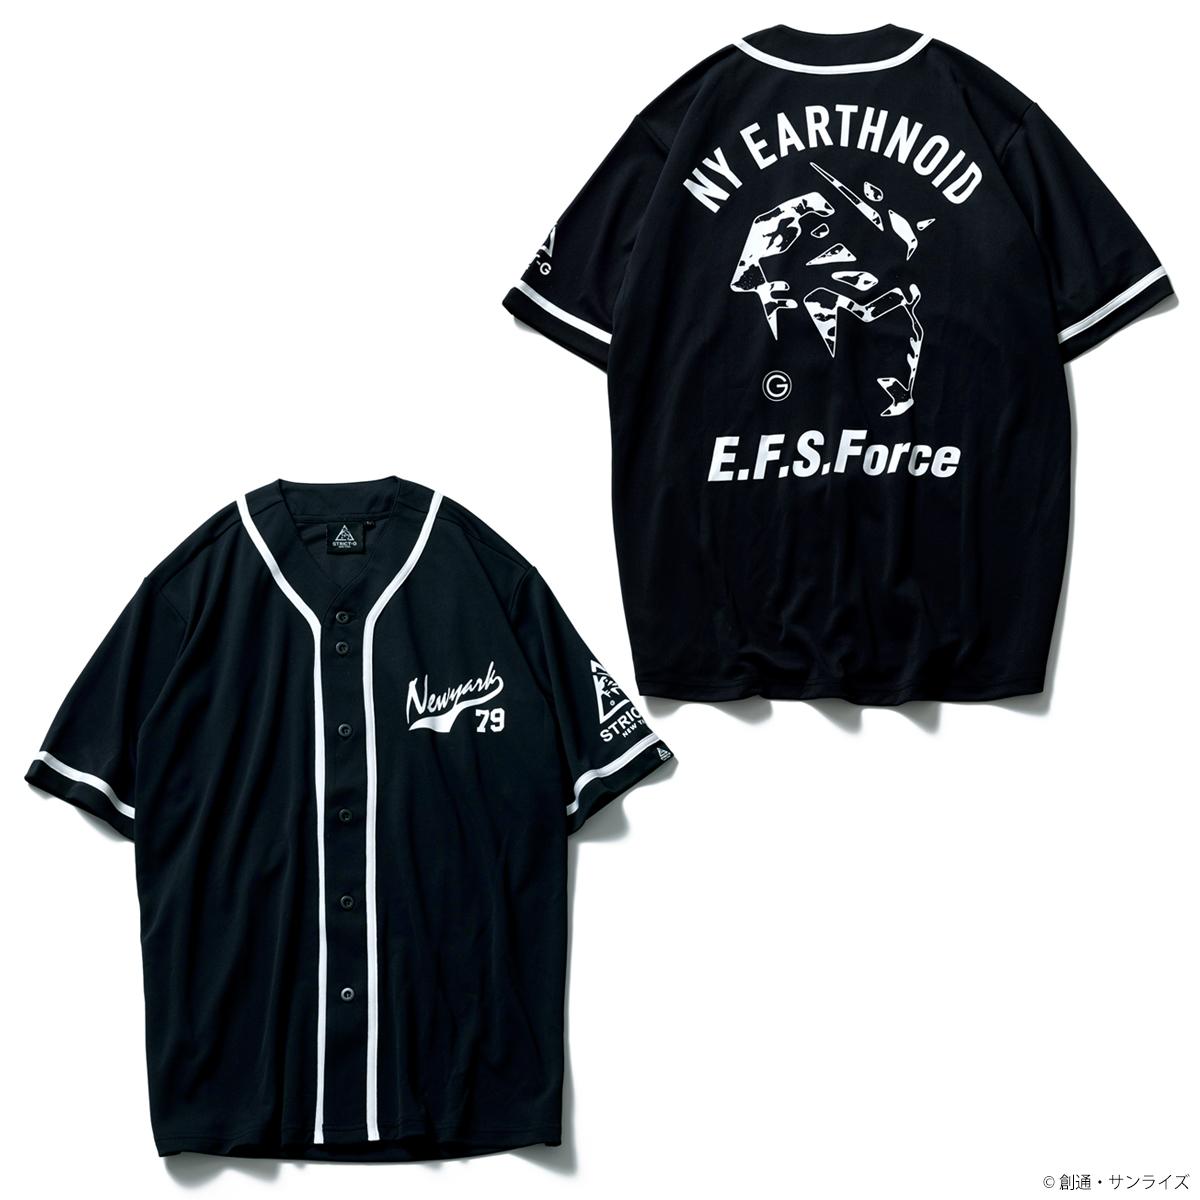 STRICT-G NEW YARK ドライベースボールシャツ E.F.S.FORCE